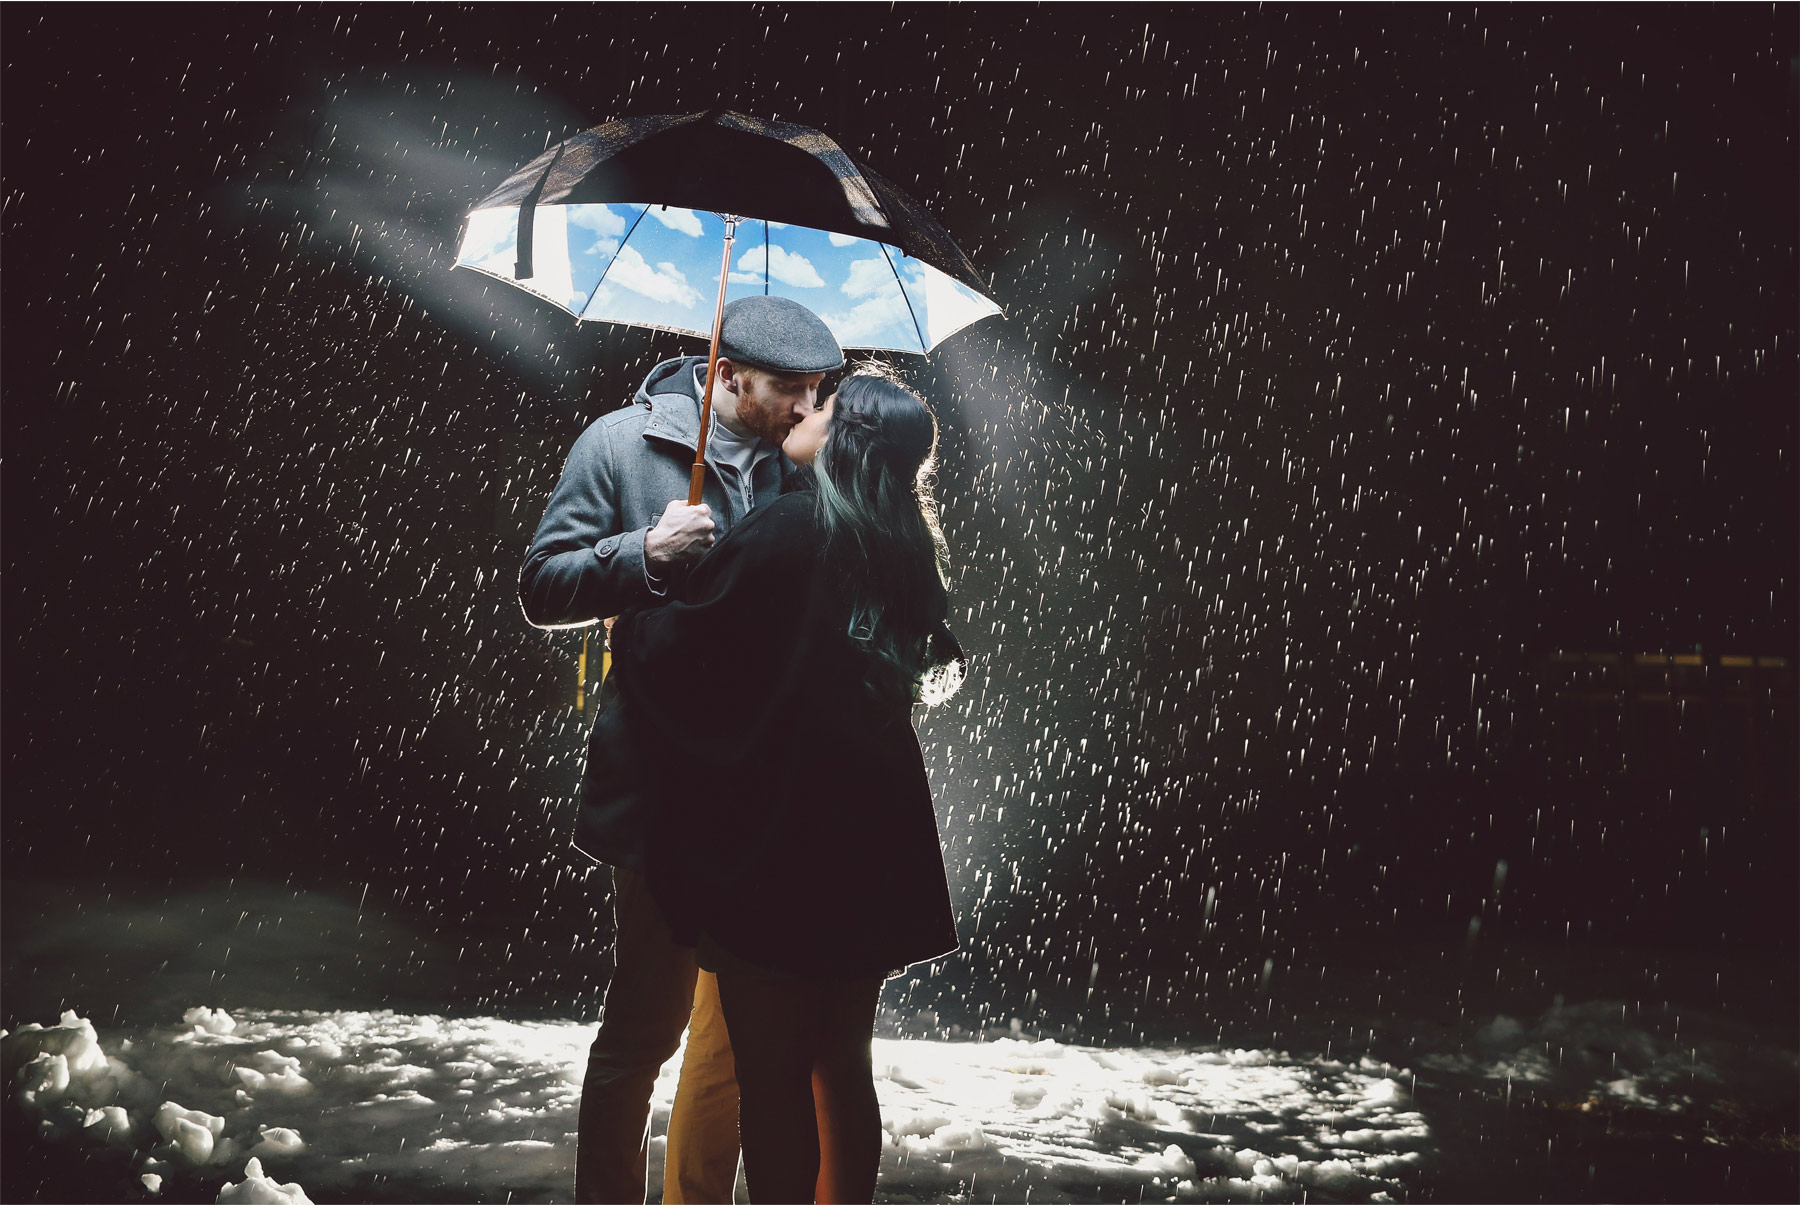 13-Harry-Potter-Themed-Engagement-Session-Minnesota-Wedding-Photography-Andrew-Vick-Night-Rain-Umbrella-Elena-and-Doug.jpg